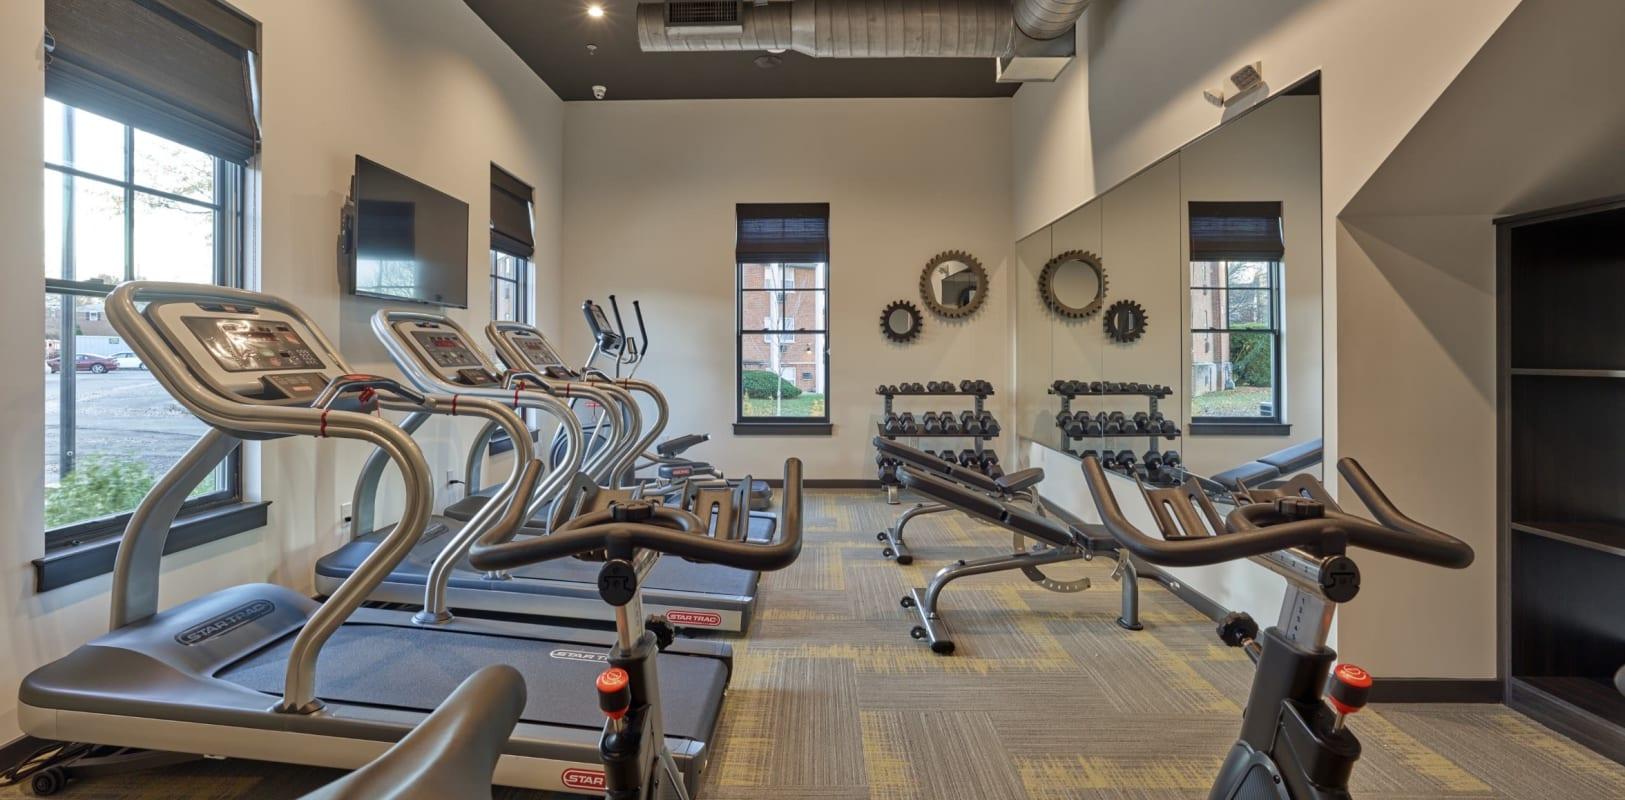 An onsite gym at The Mills at Lehigh in Bethlehem, Pennsylvania